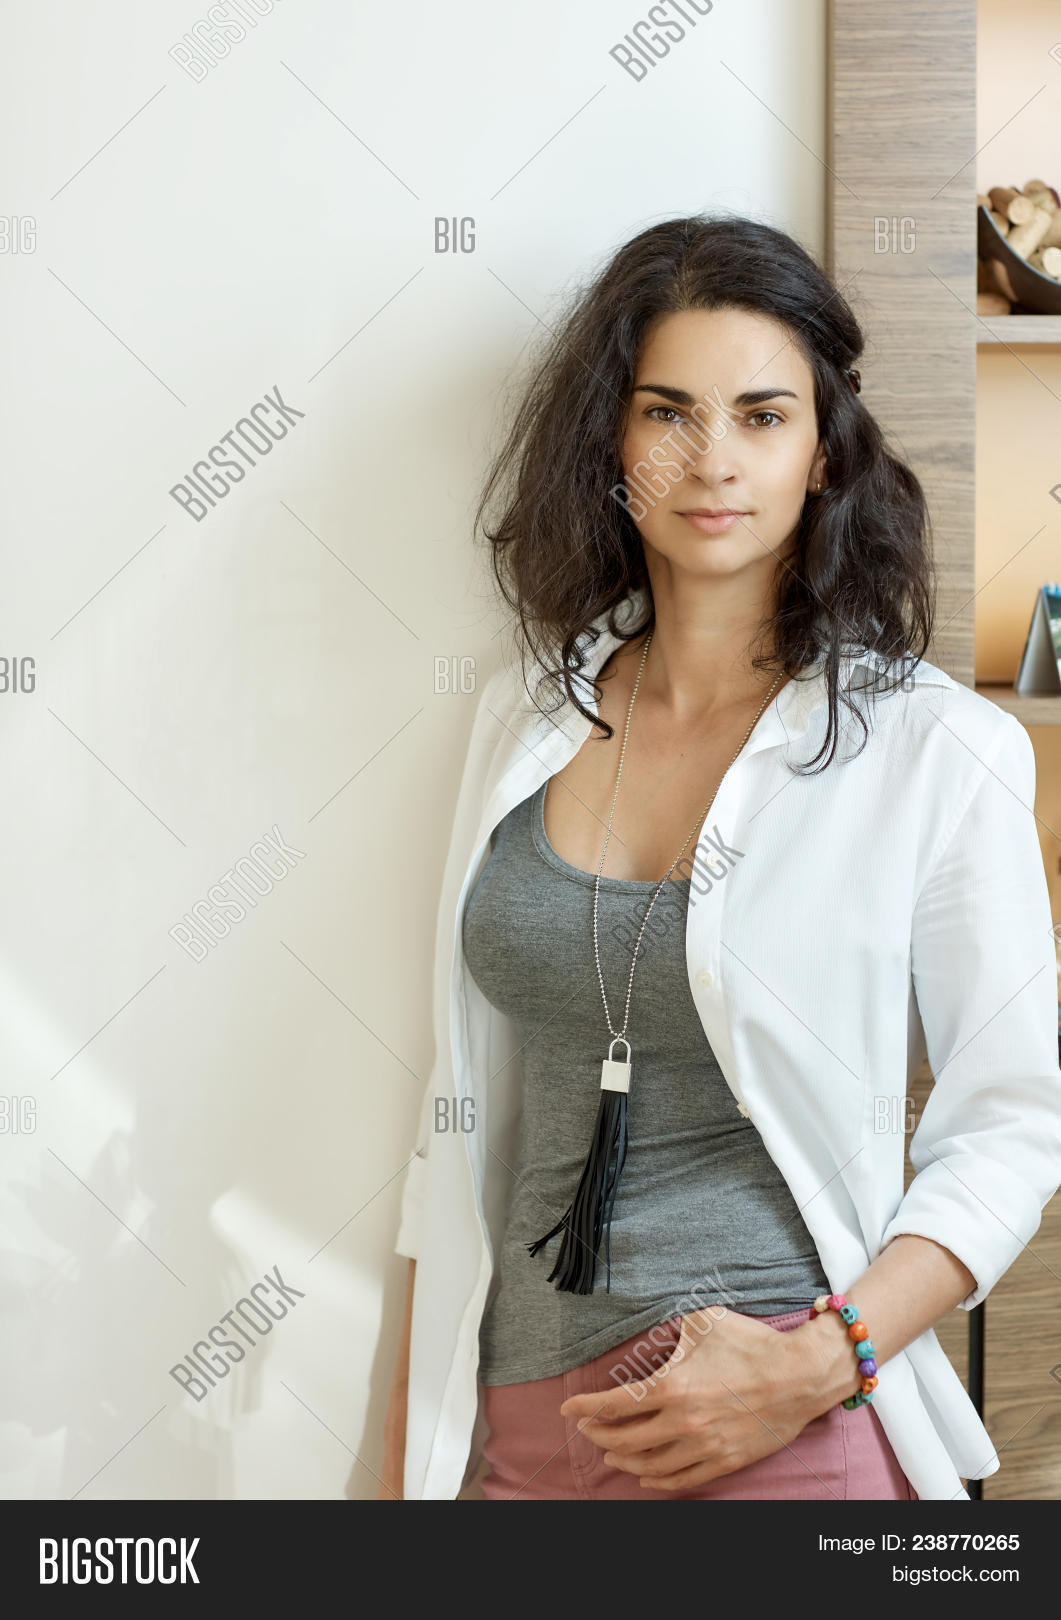 Stylish Attractive Image Photo Free Trial Bigstock